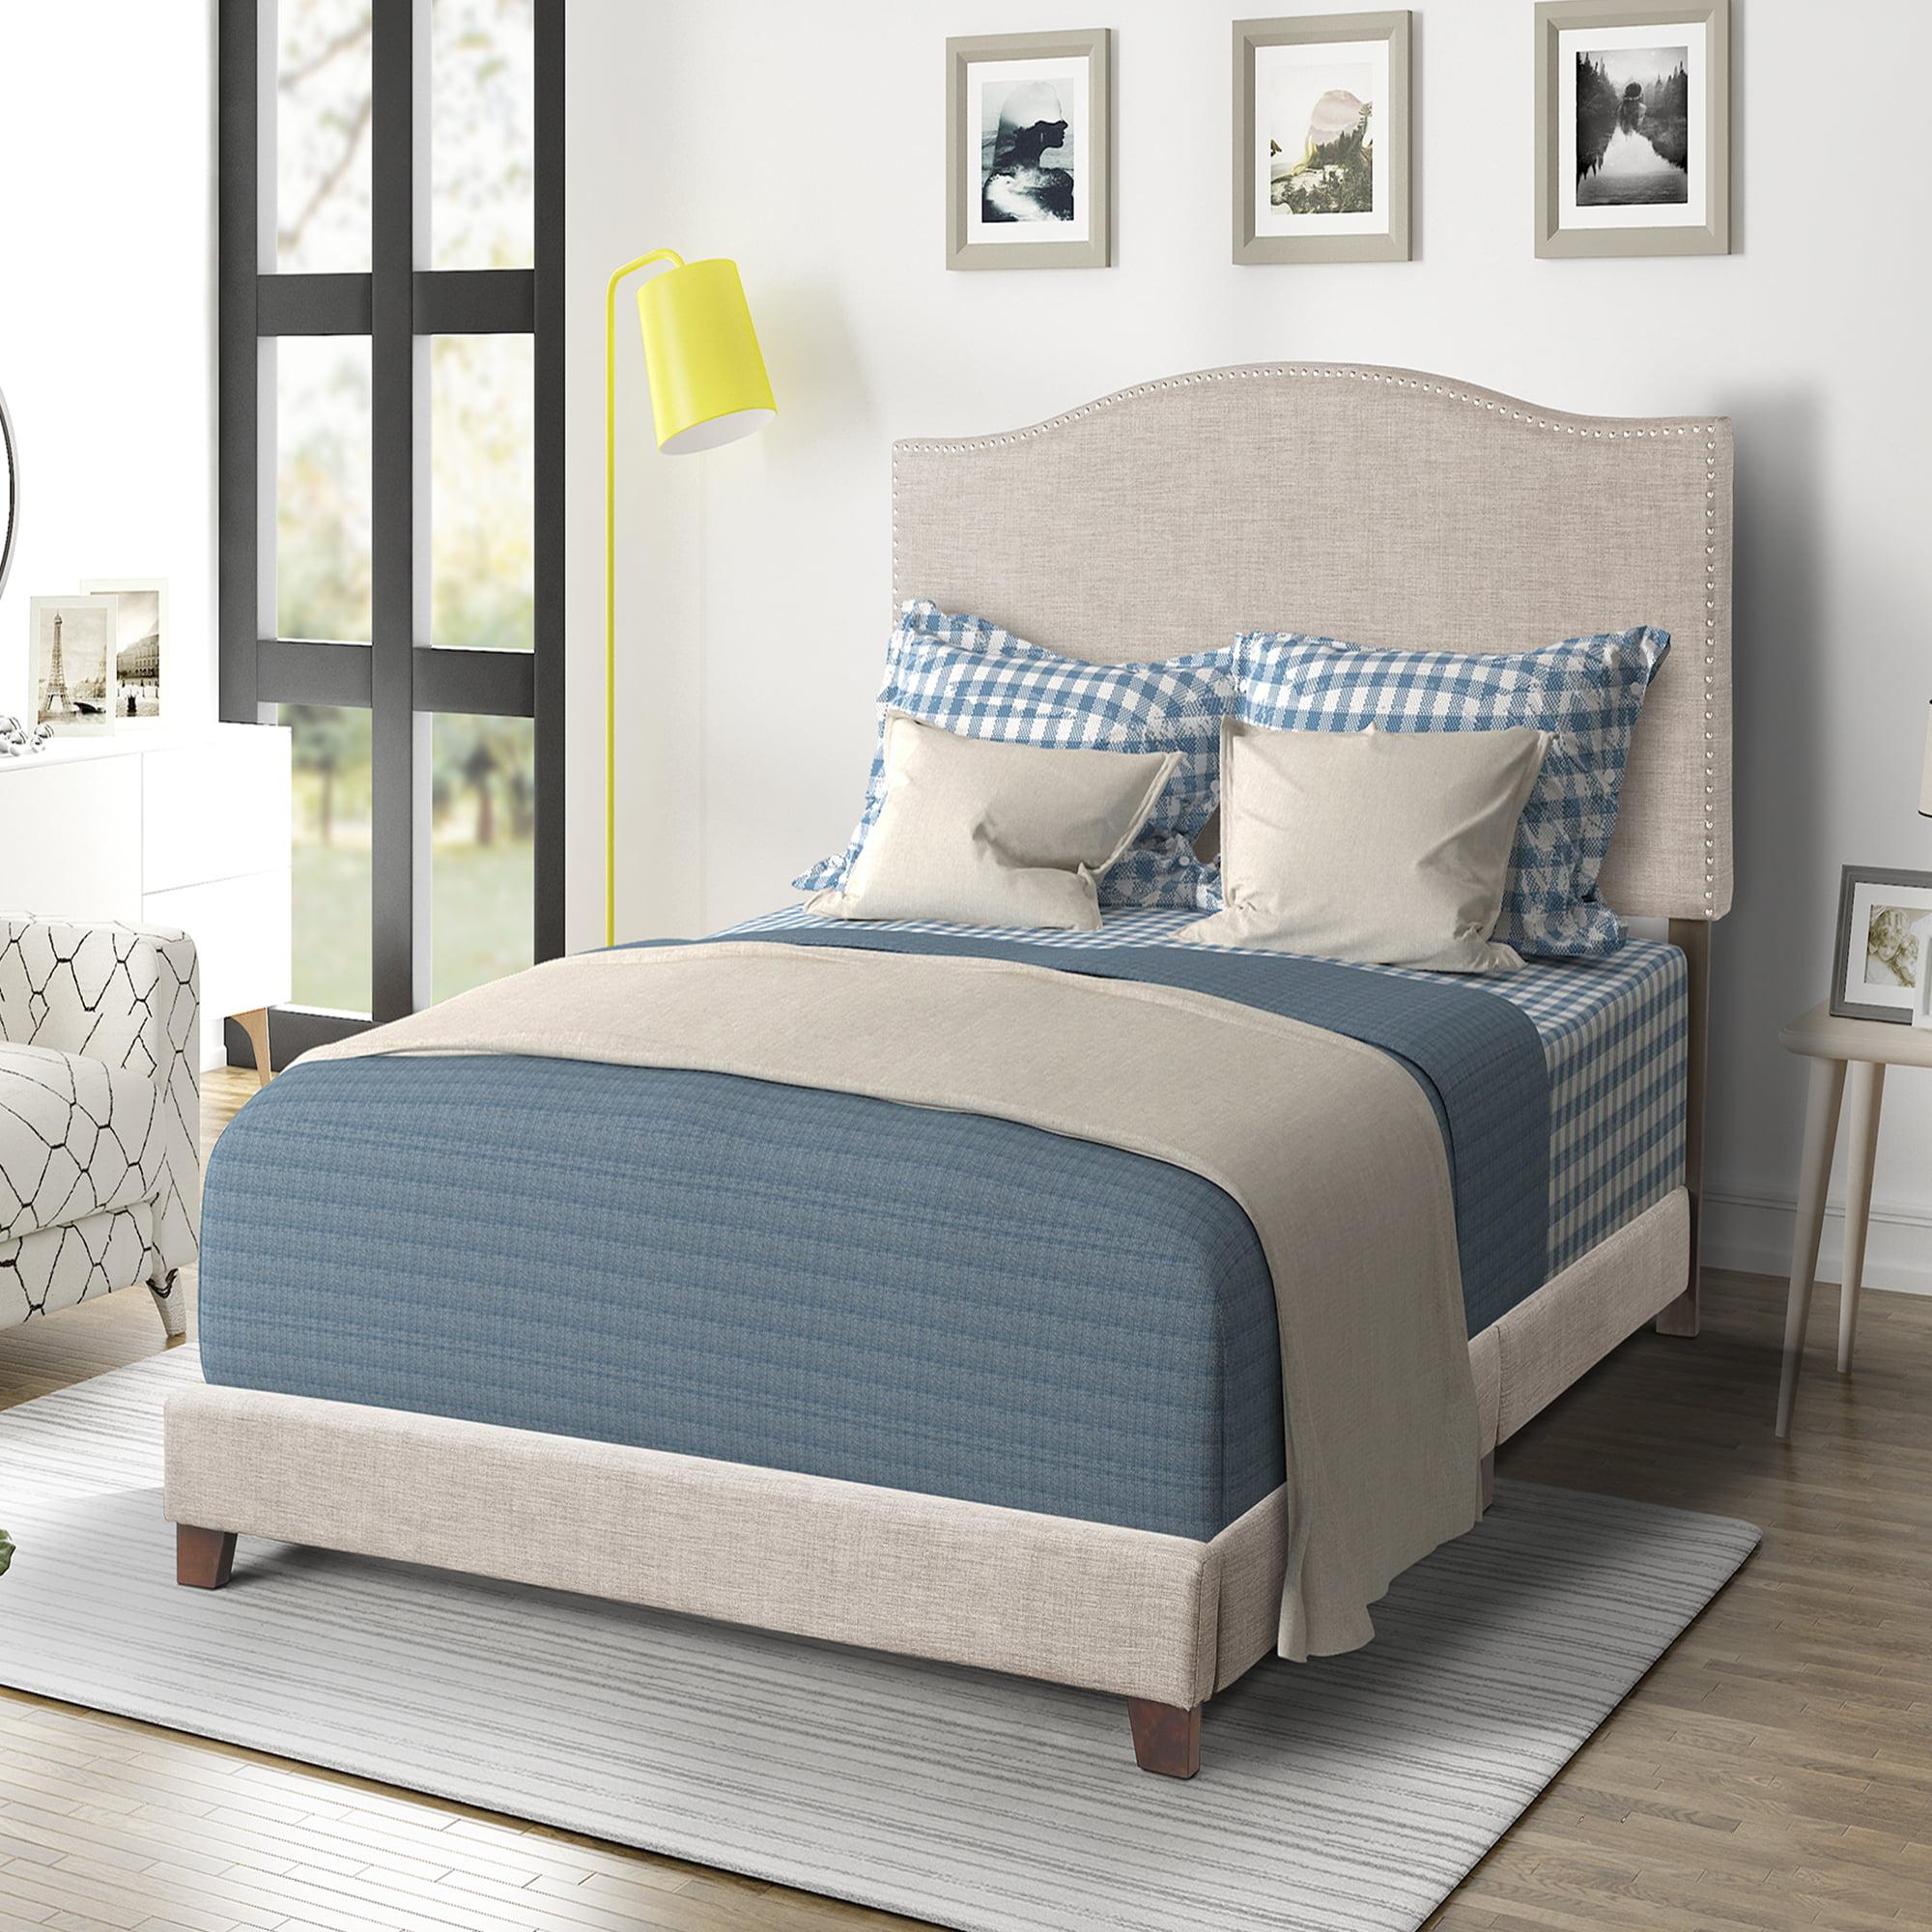 Harper & Bright Designs Wilshire Upholstered Linen Nail Head Trim Platform Bed with Slat Support, Multiple Sizes (Beige)